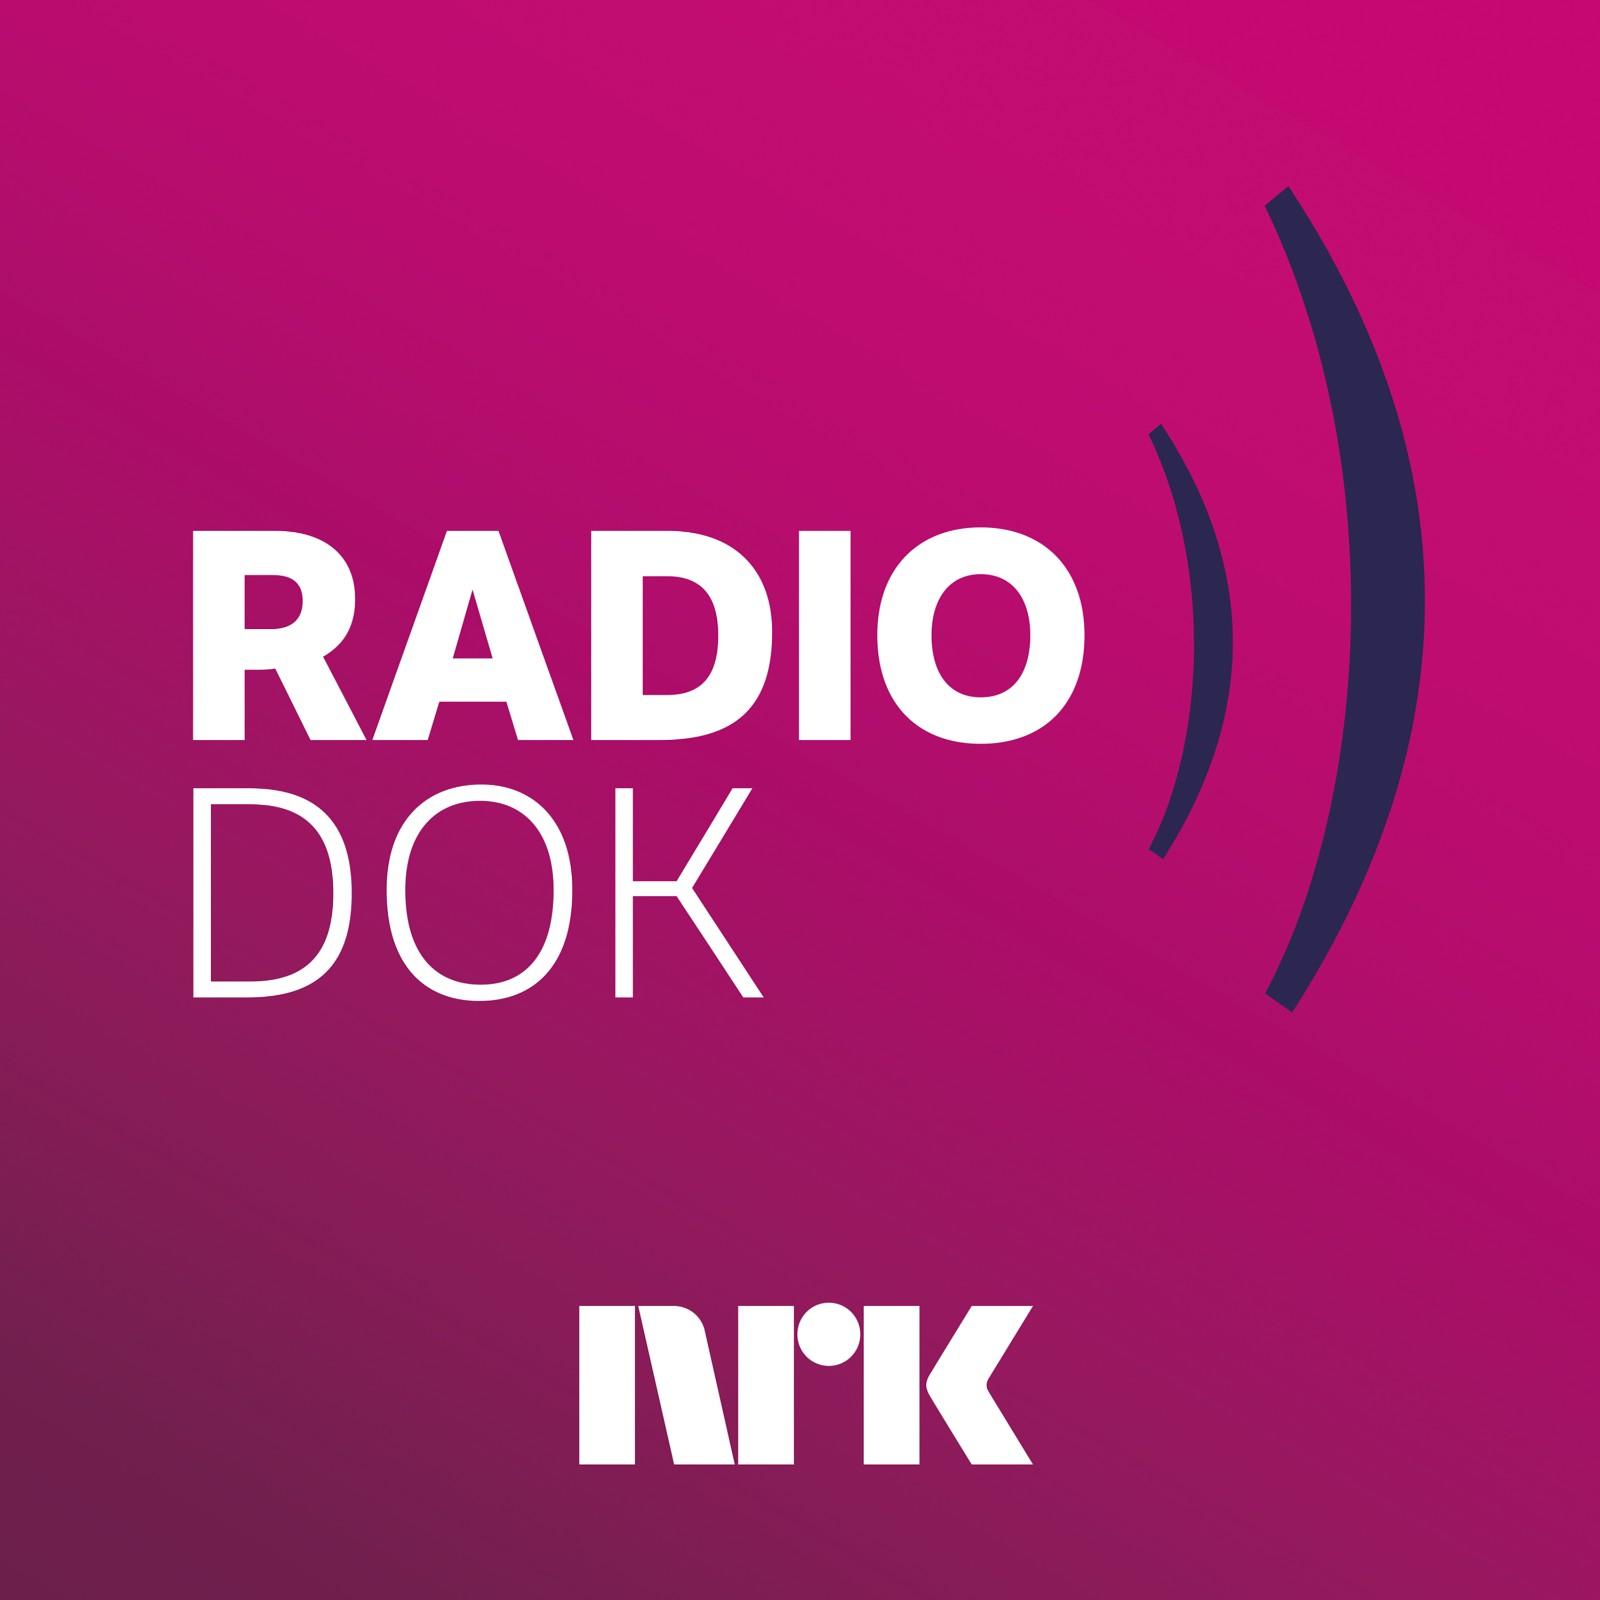 topp-5-podcaster-radiodok-nrk